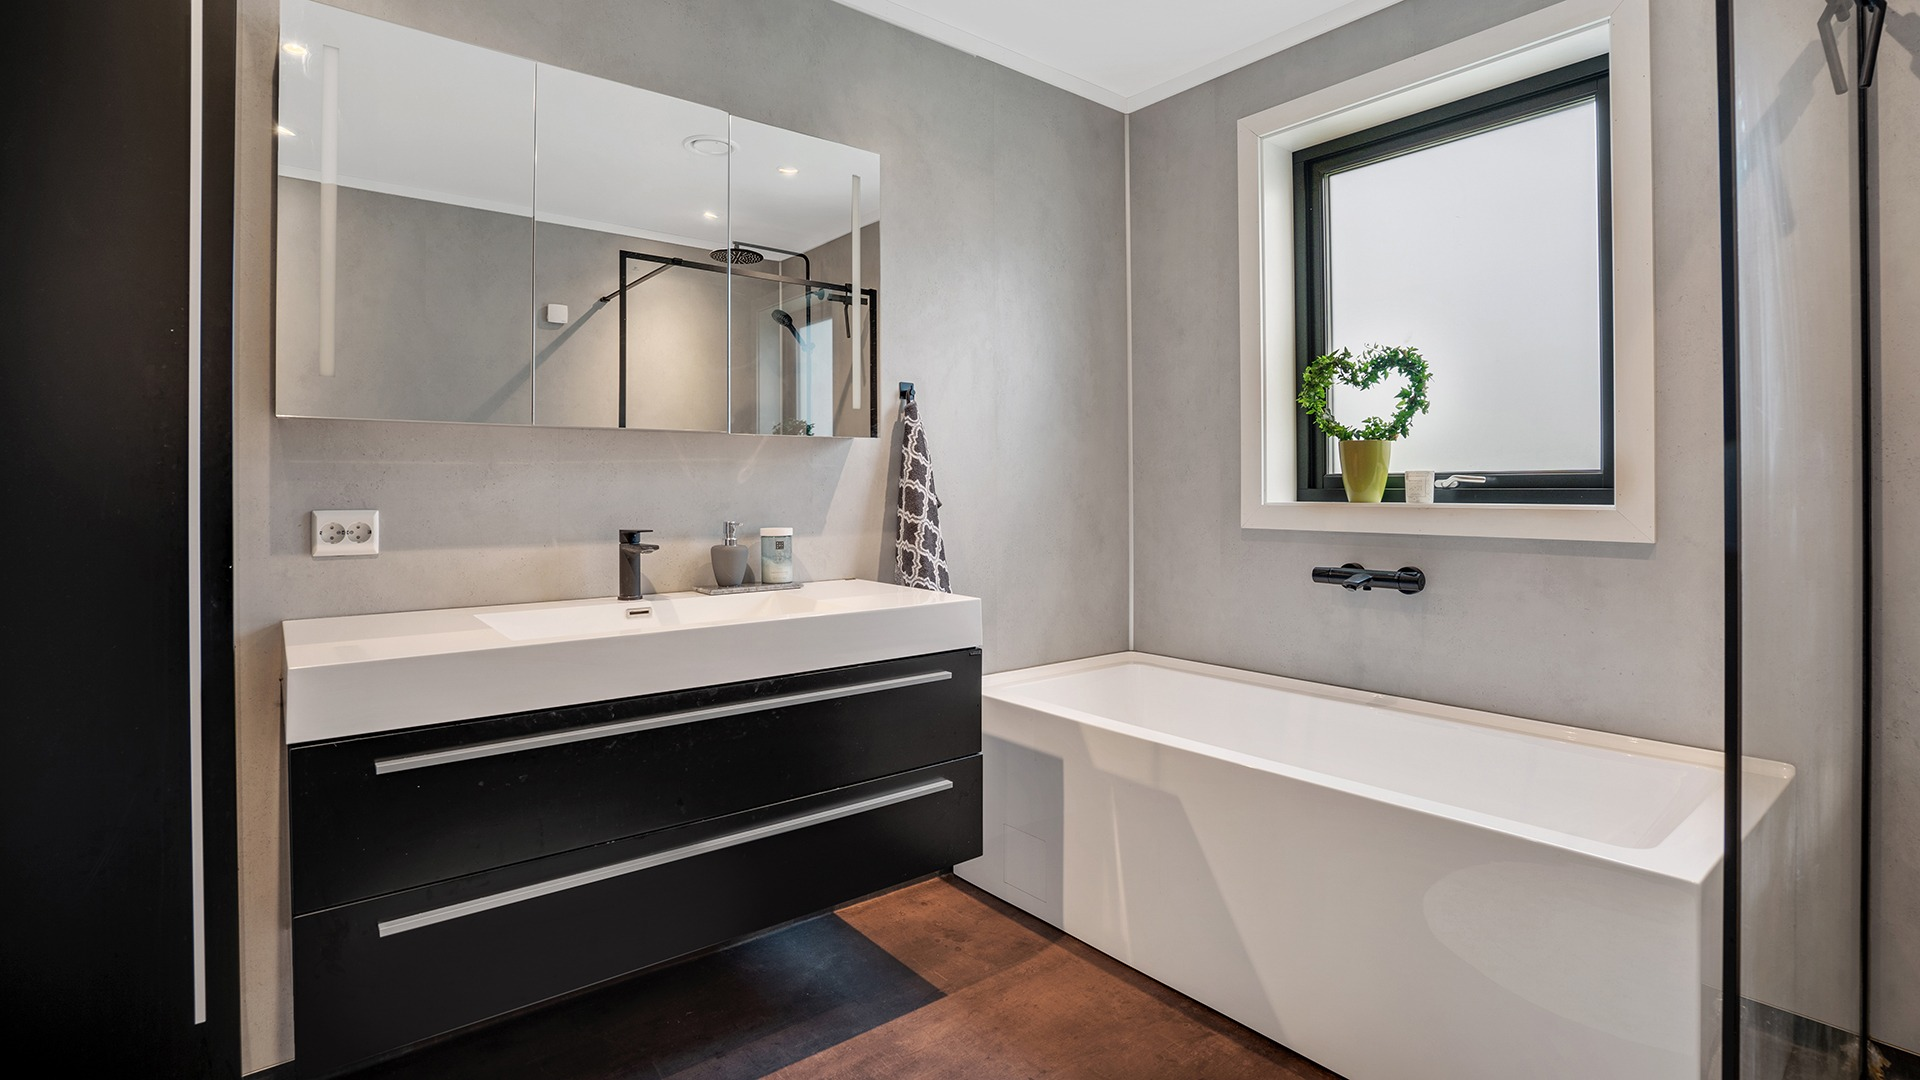 Lekkert bad med både badekar og dusjhjørne